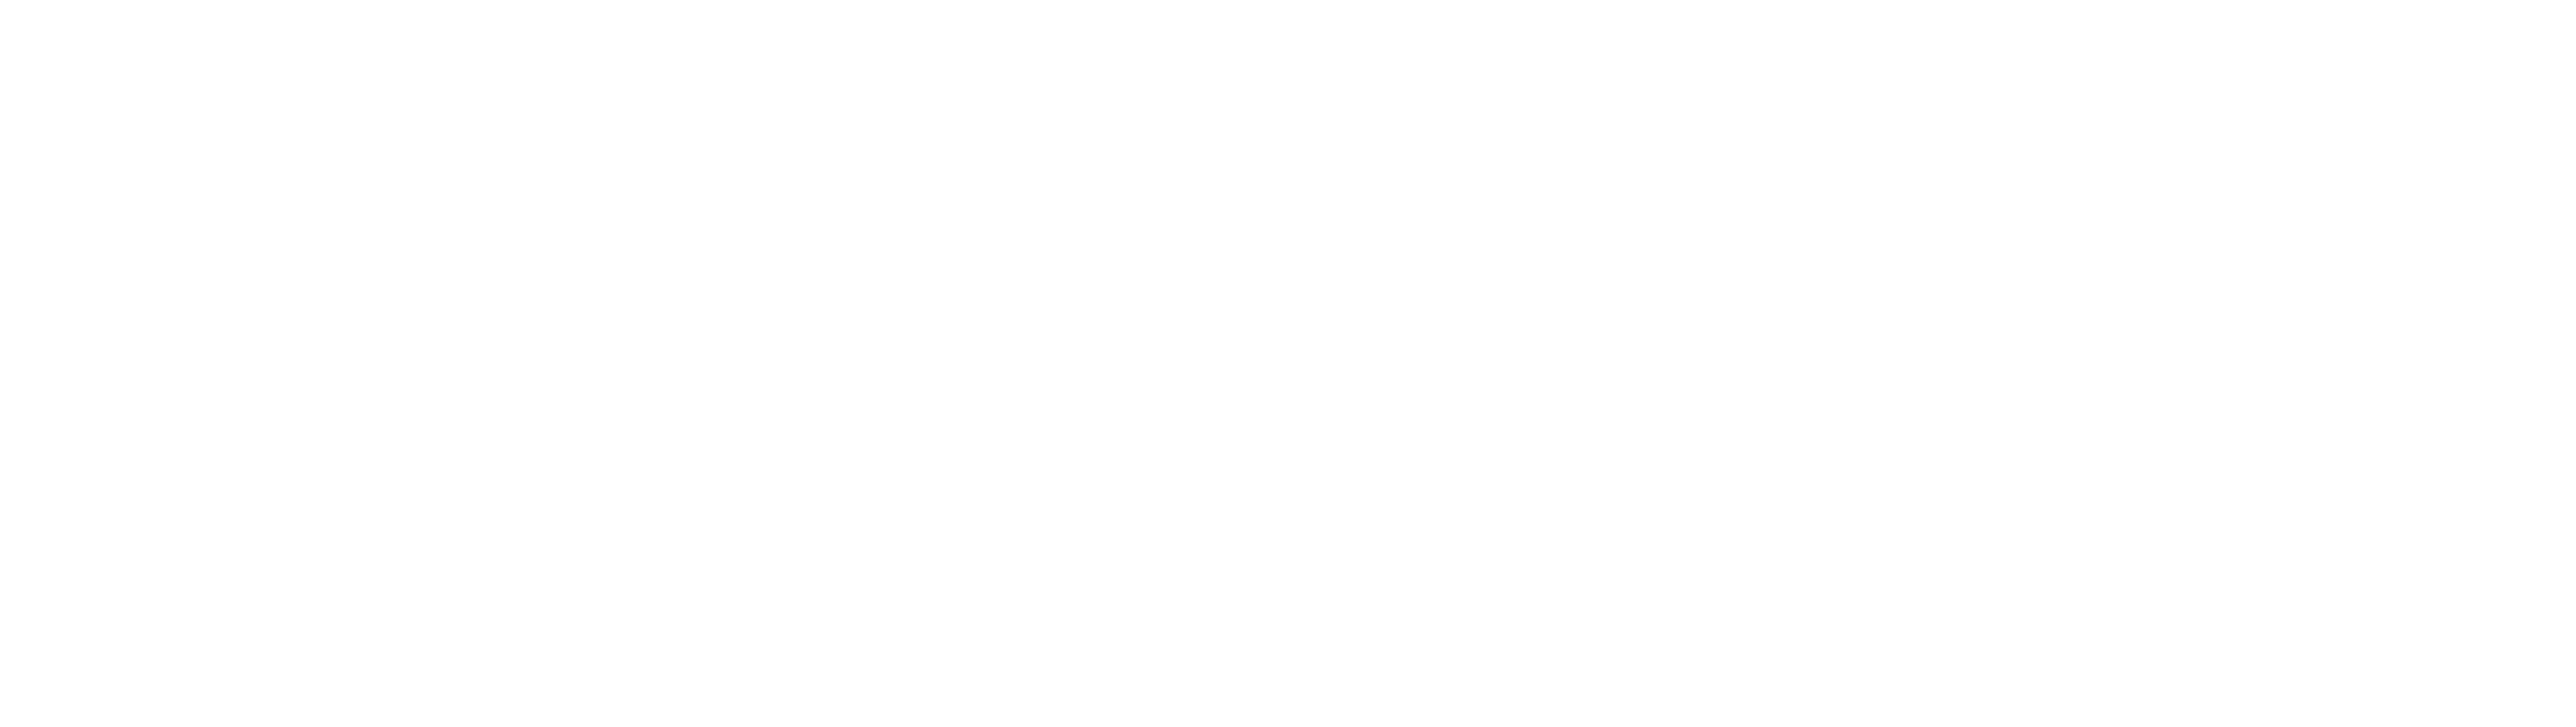 IASIWEB.RO